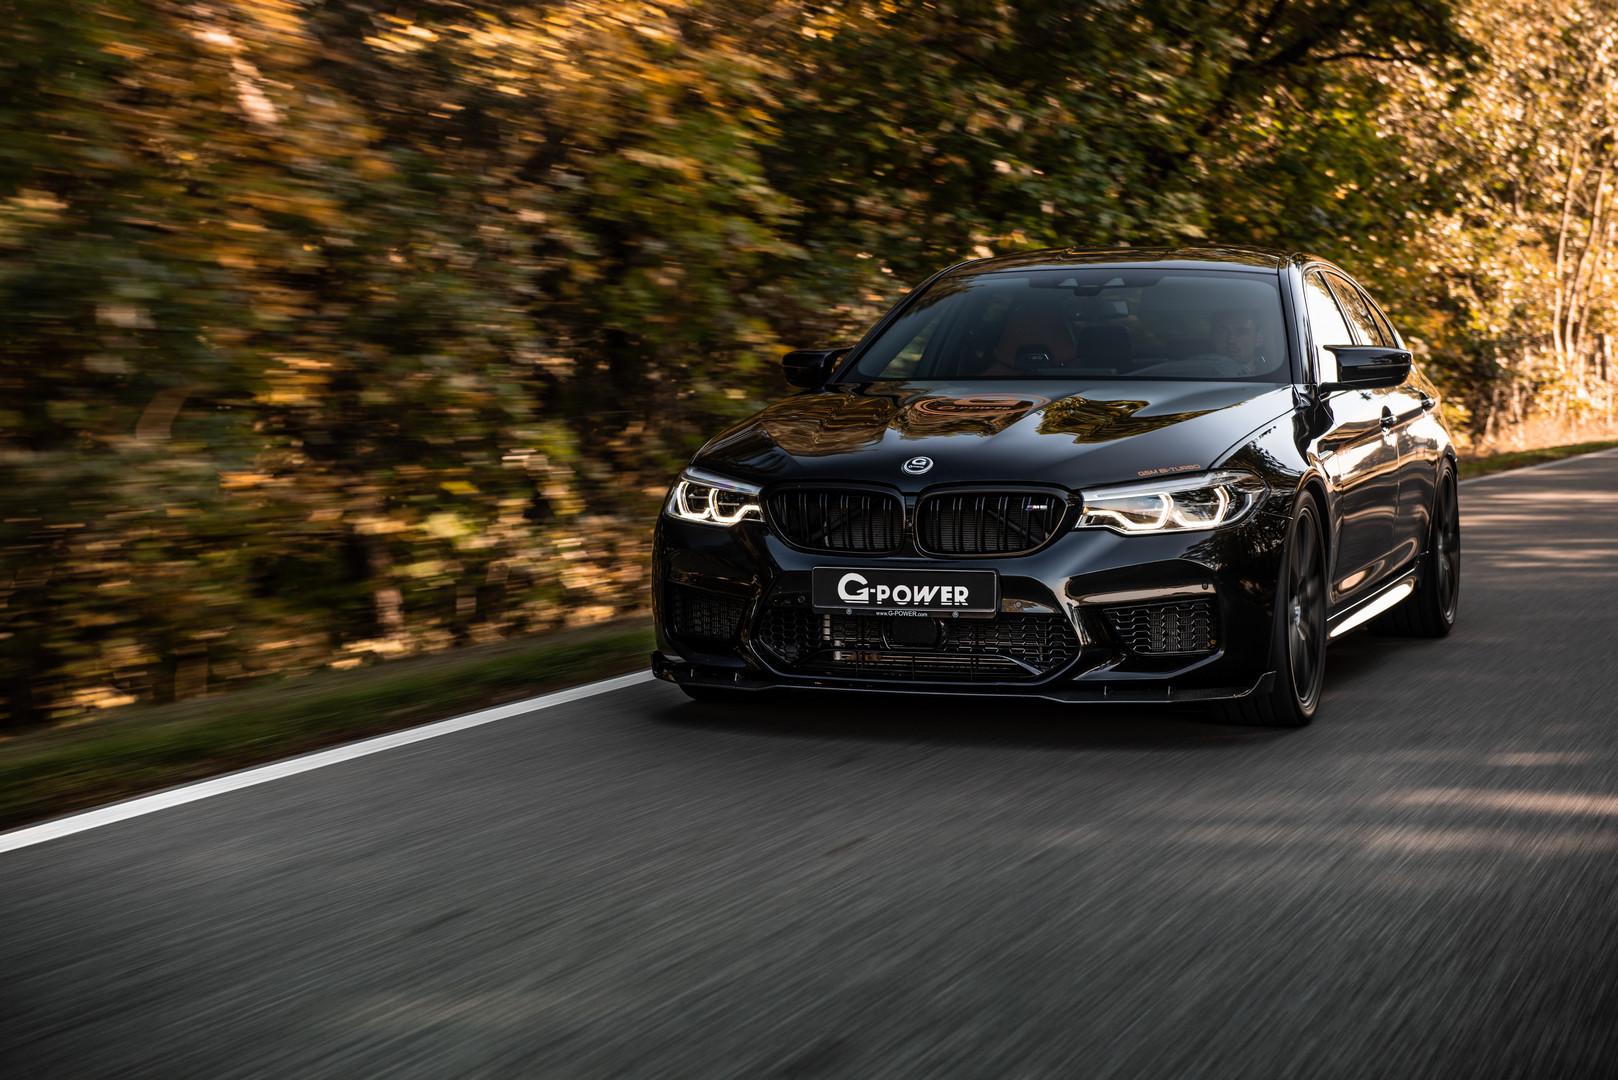 G-Power BMW F90 M5 800hp